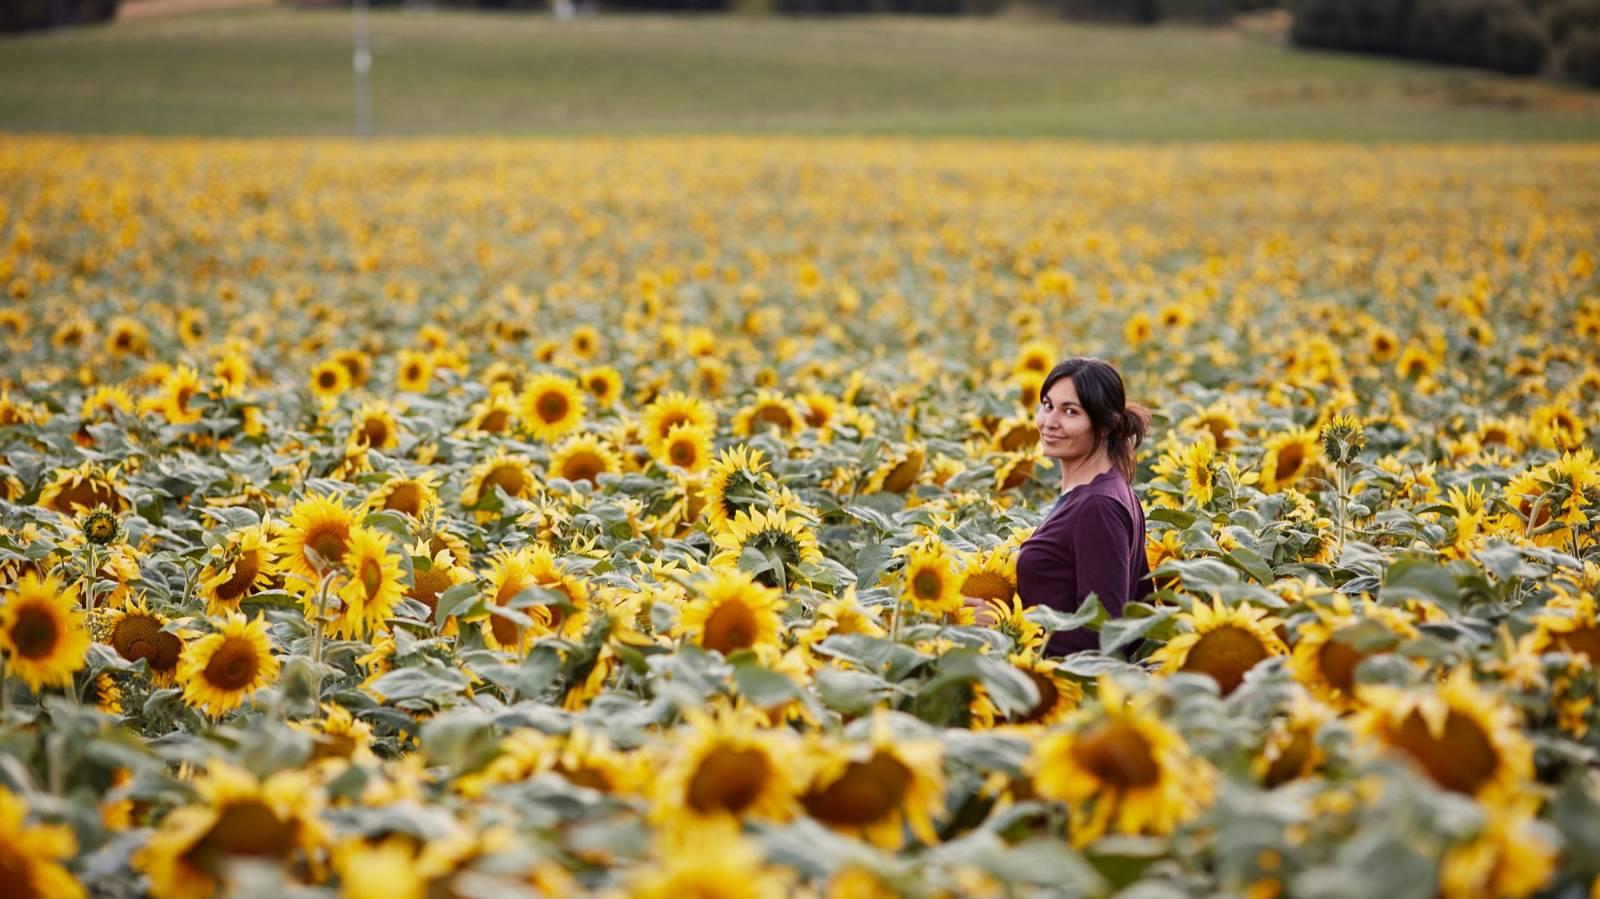 Nadia Lim: Why I planted 968,000 sunflowers